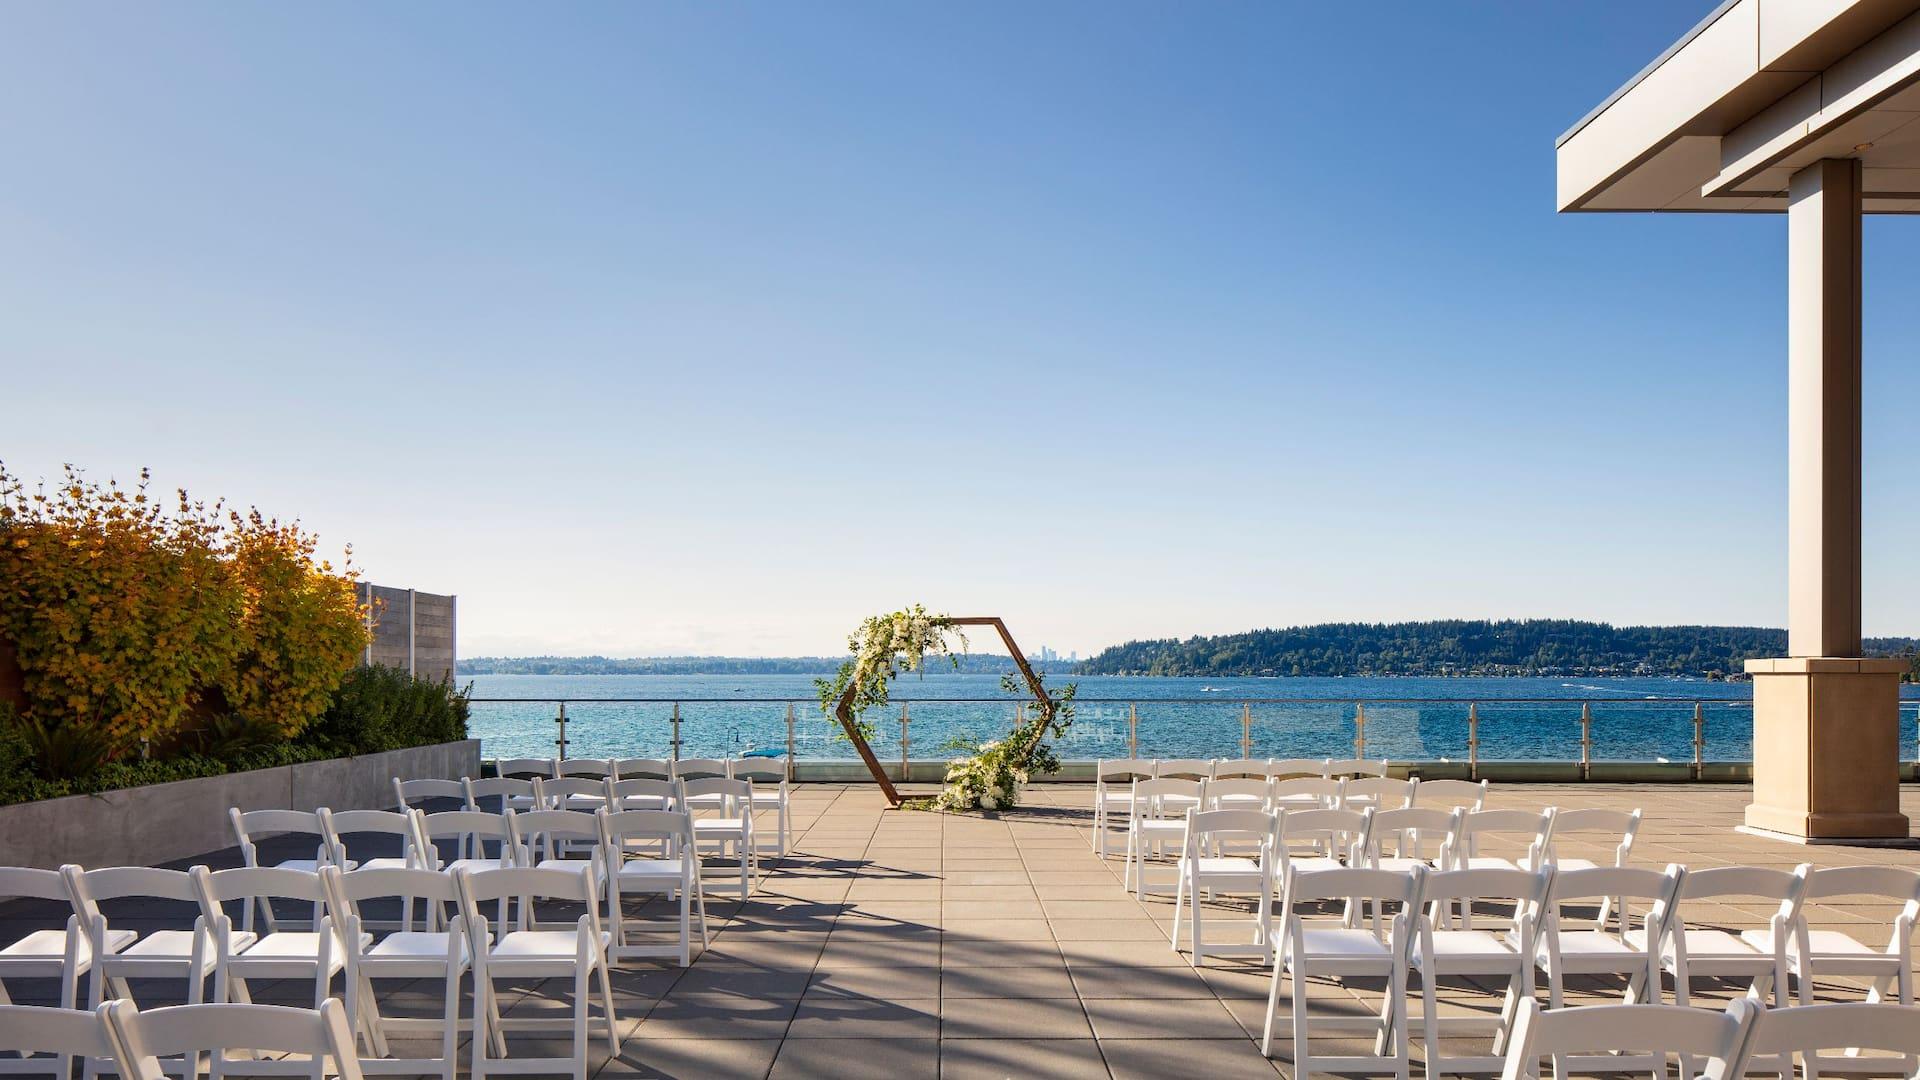 Wedding Ceremony on Olympic Terrace at Hyatt Regency Lake Washington